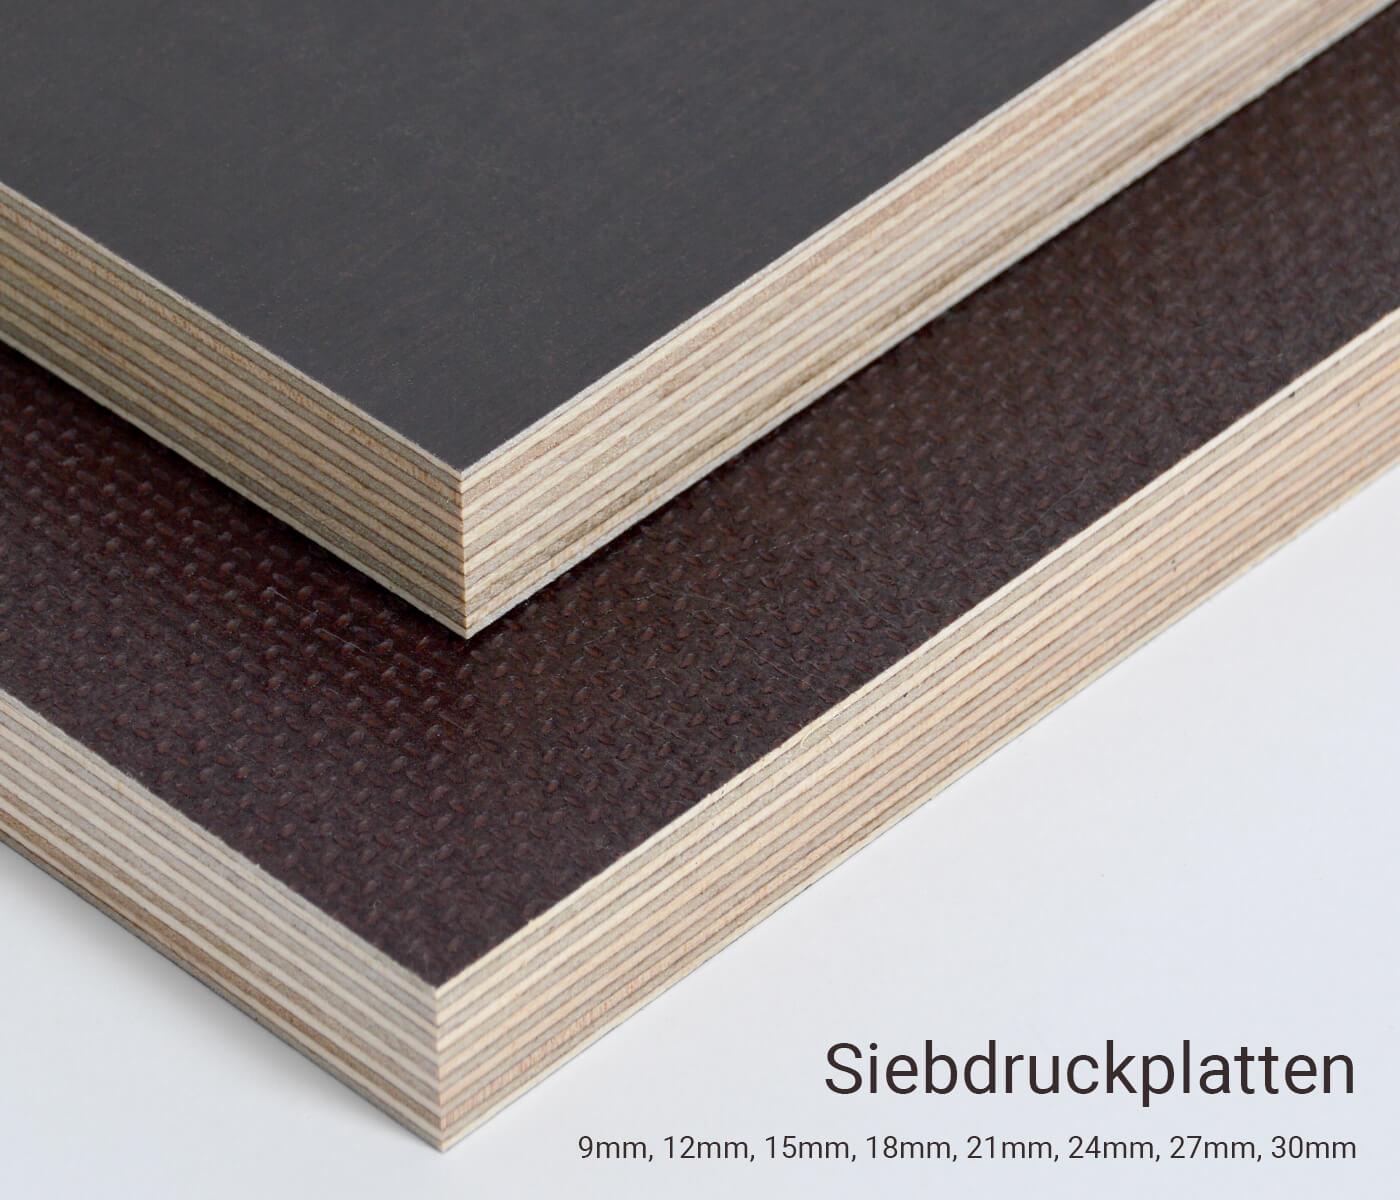 30x150 cm 9mm Multiplex Zuschnitt L/änge bis 200cm Multiplexplatten Zuschnitte Auswahl